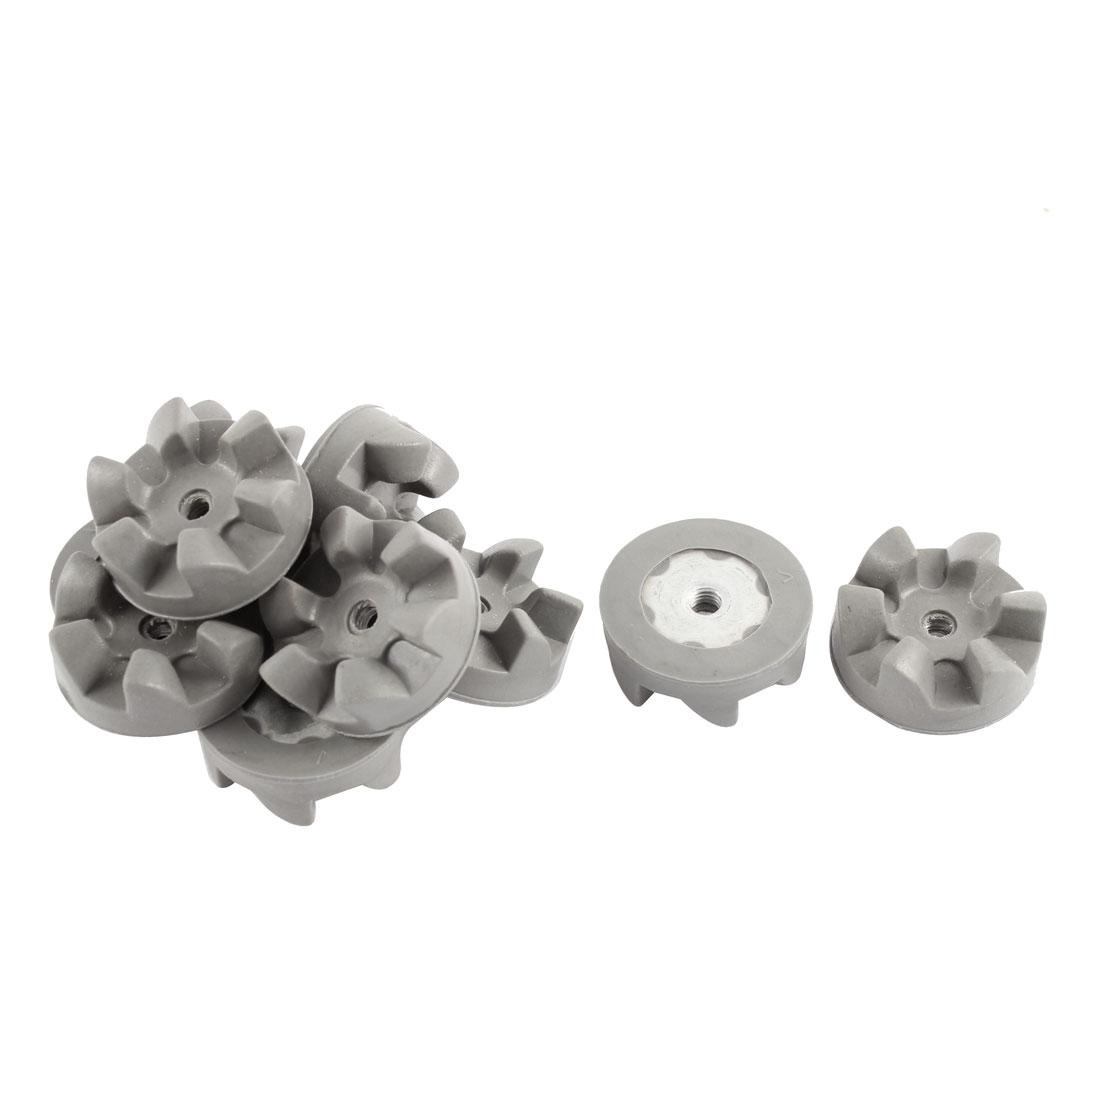 10 Pcs 6 Teeth 30mm Dia Kitchen Aid Blender Clutch Coupling Coupler Gray